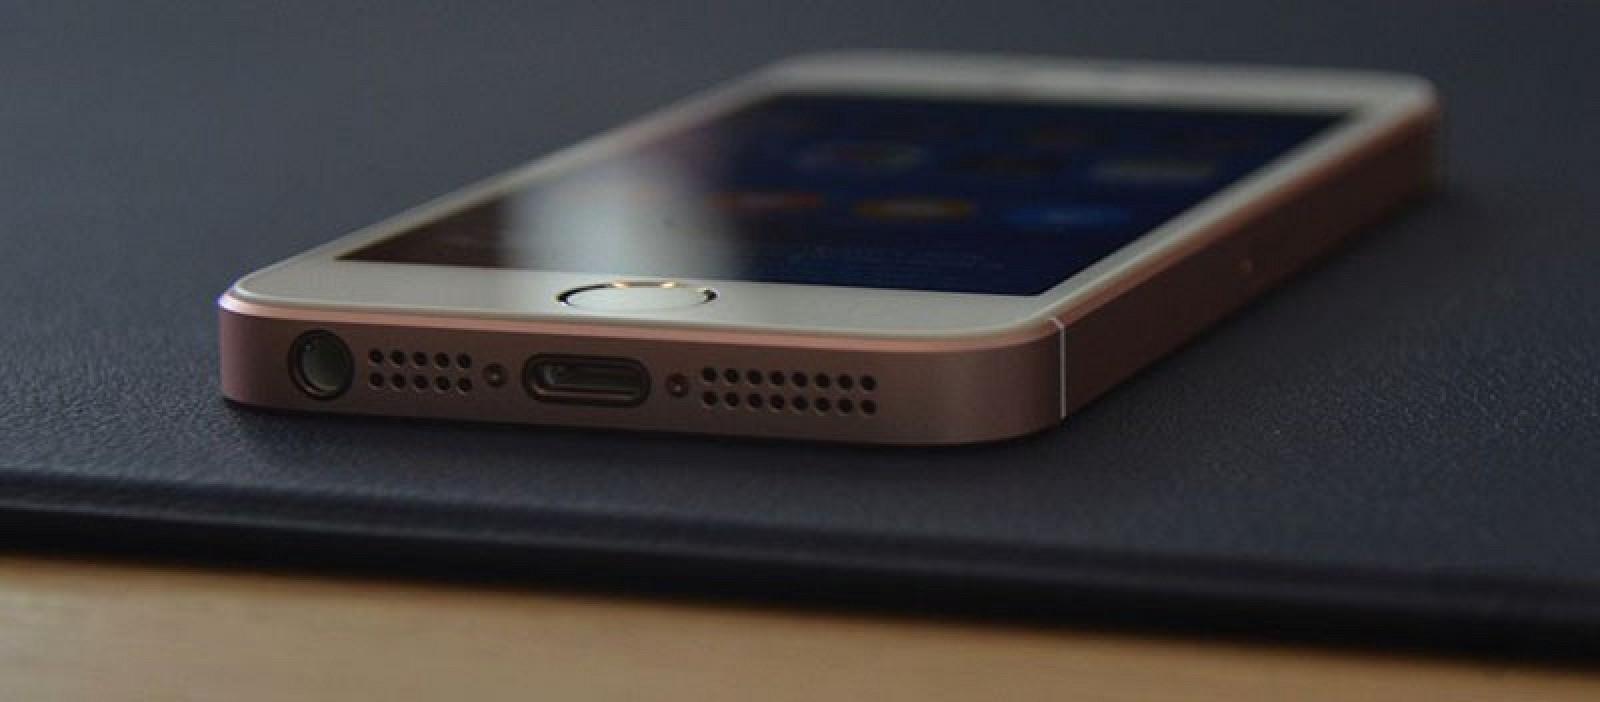 iPhone-SE-matte-800x351.jpg